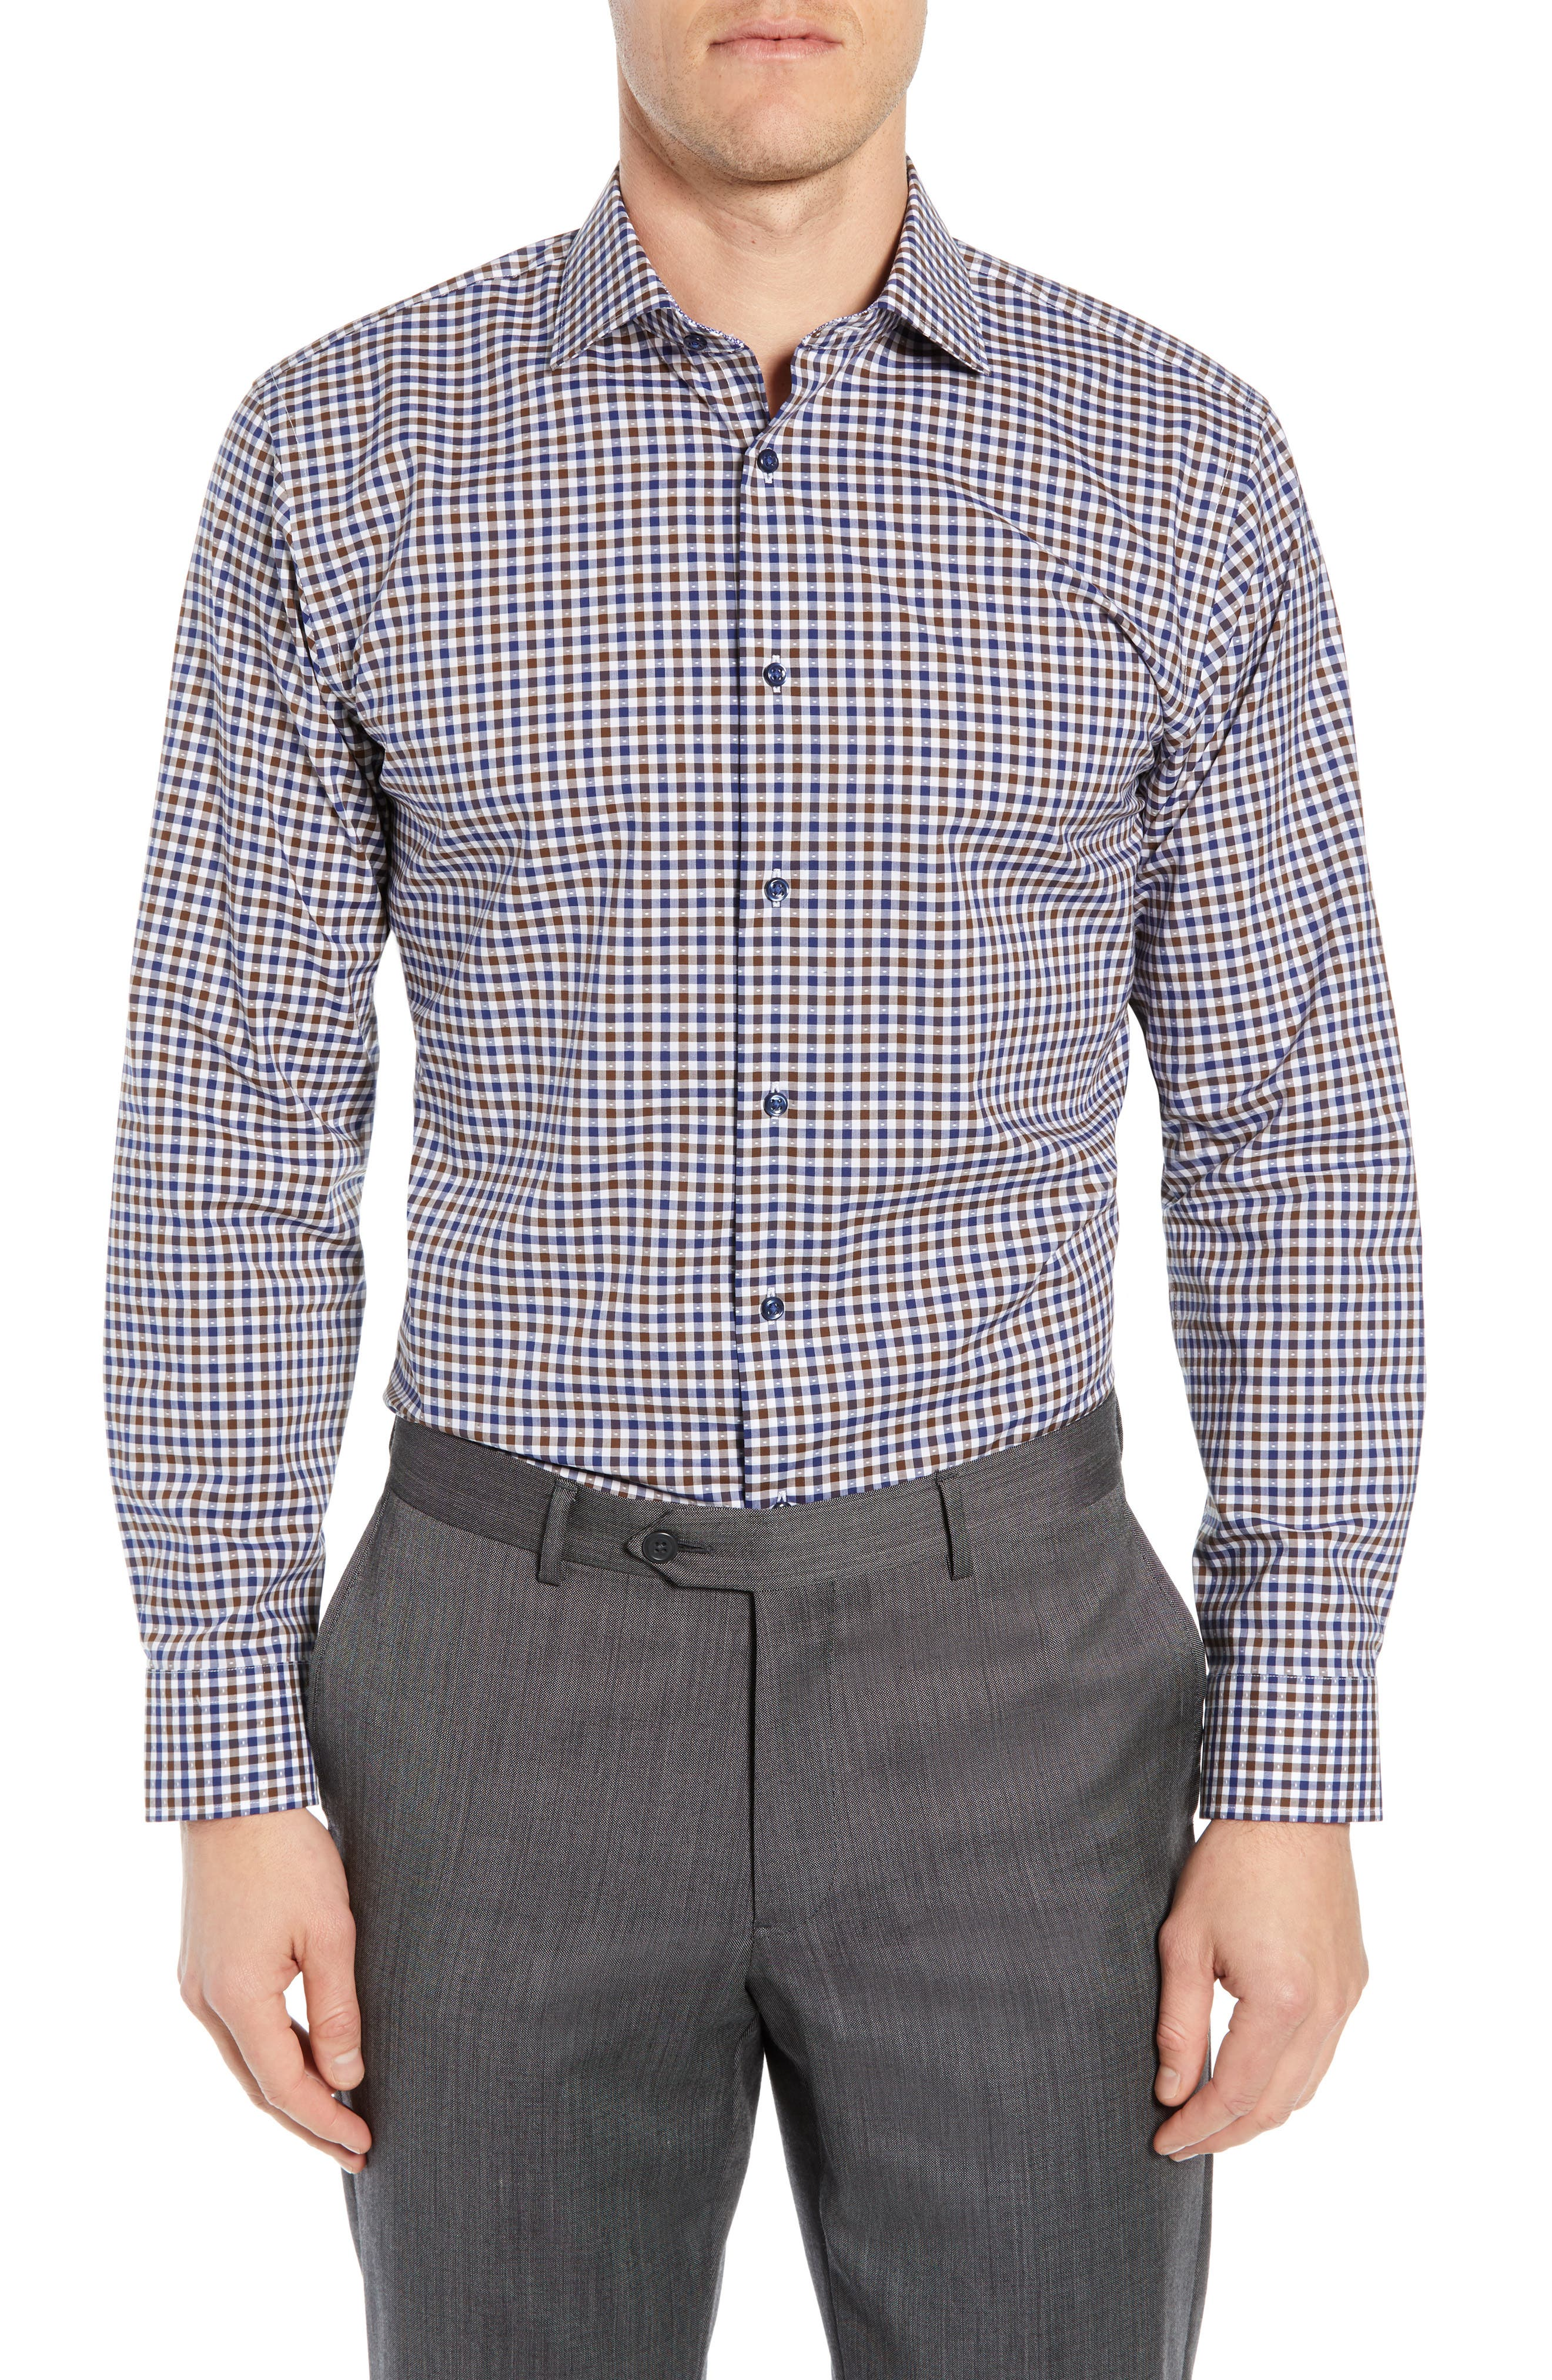 NORDSTROM MEN'S SHOP, Trim Fit Non-Iron Check Dress Shirt, Main thumbnail 1, color, BROWN FAWN